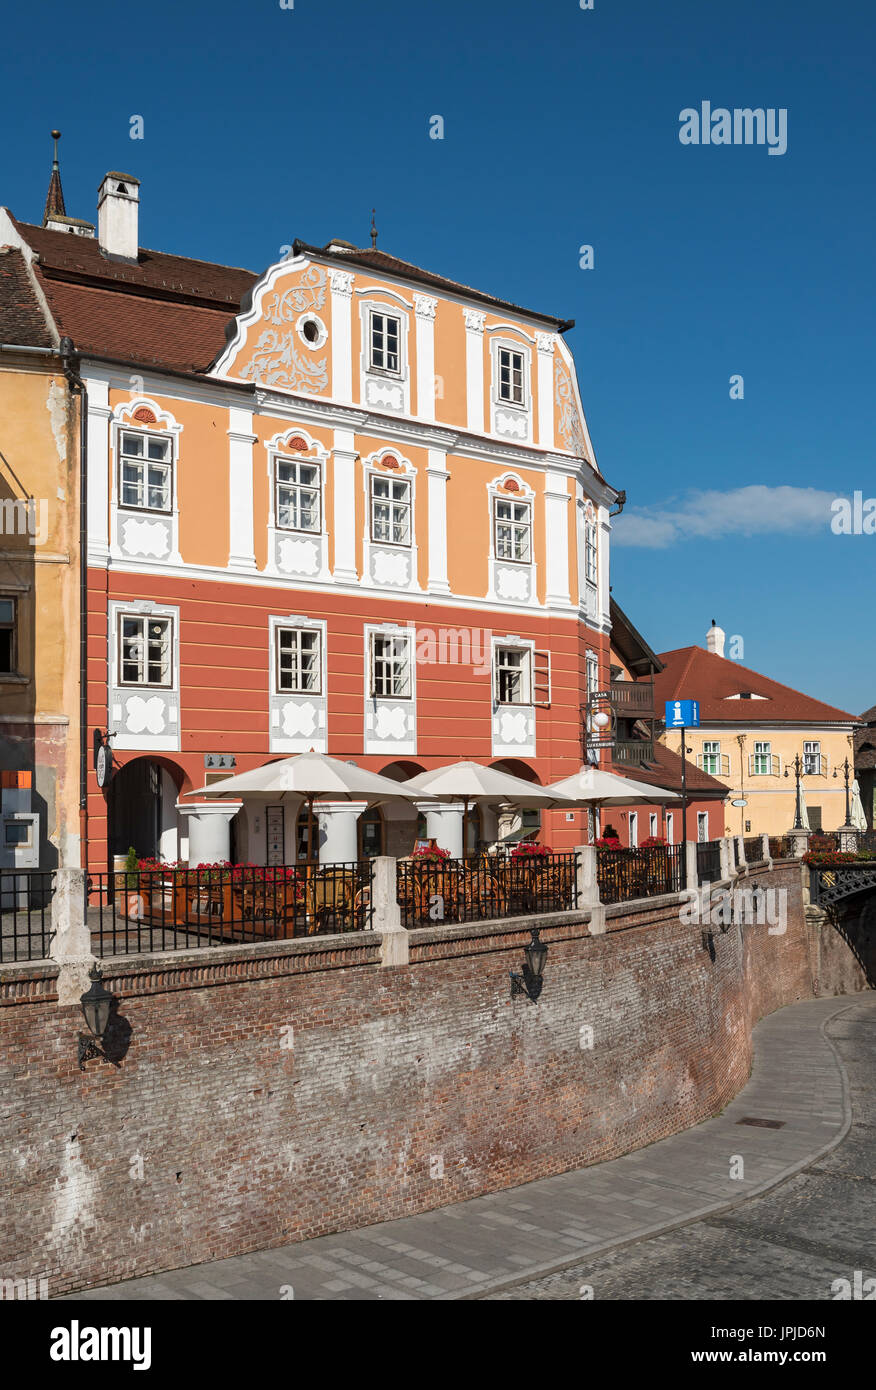 Casa Luxemburg House, Sibiu, Romania - Stock Image